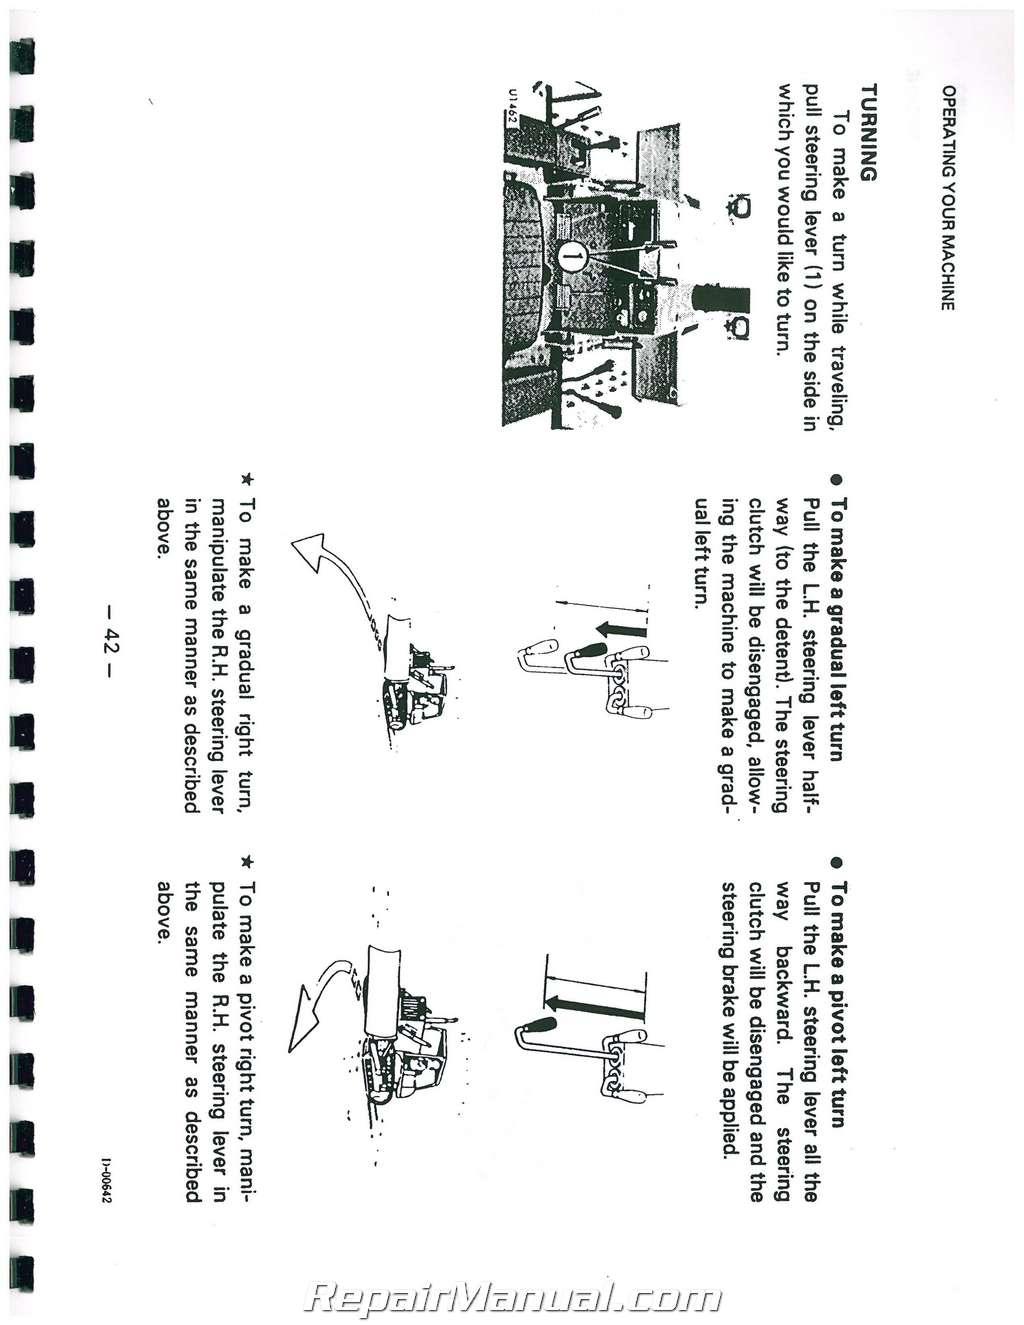 Komatsu D20A D20P D20PL D21PLL D21A D21E D21P D21PL Owners Operators Manual